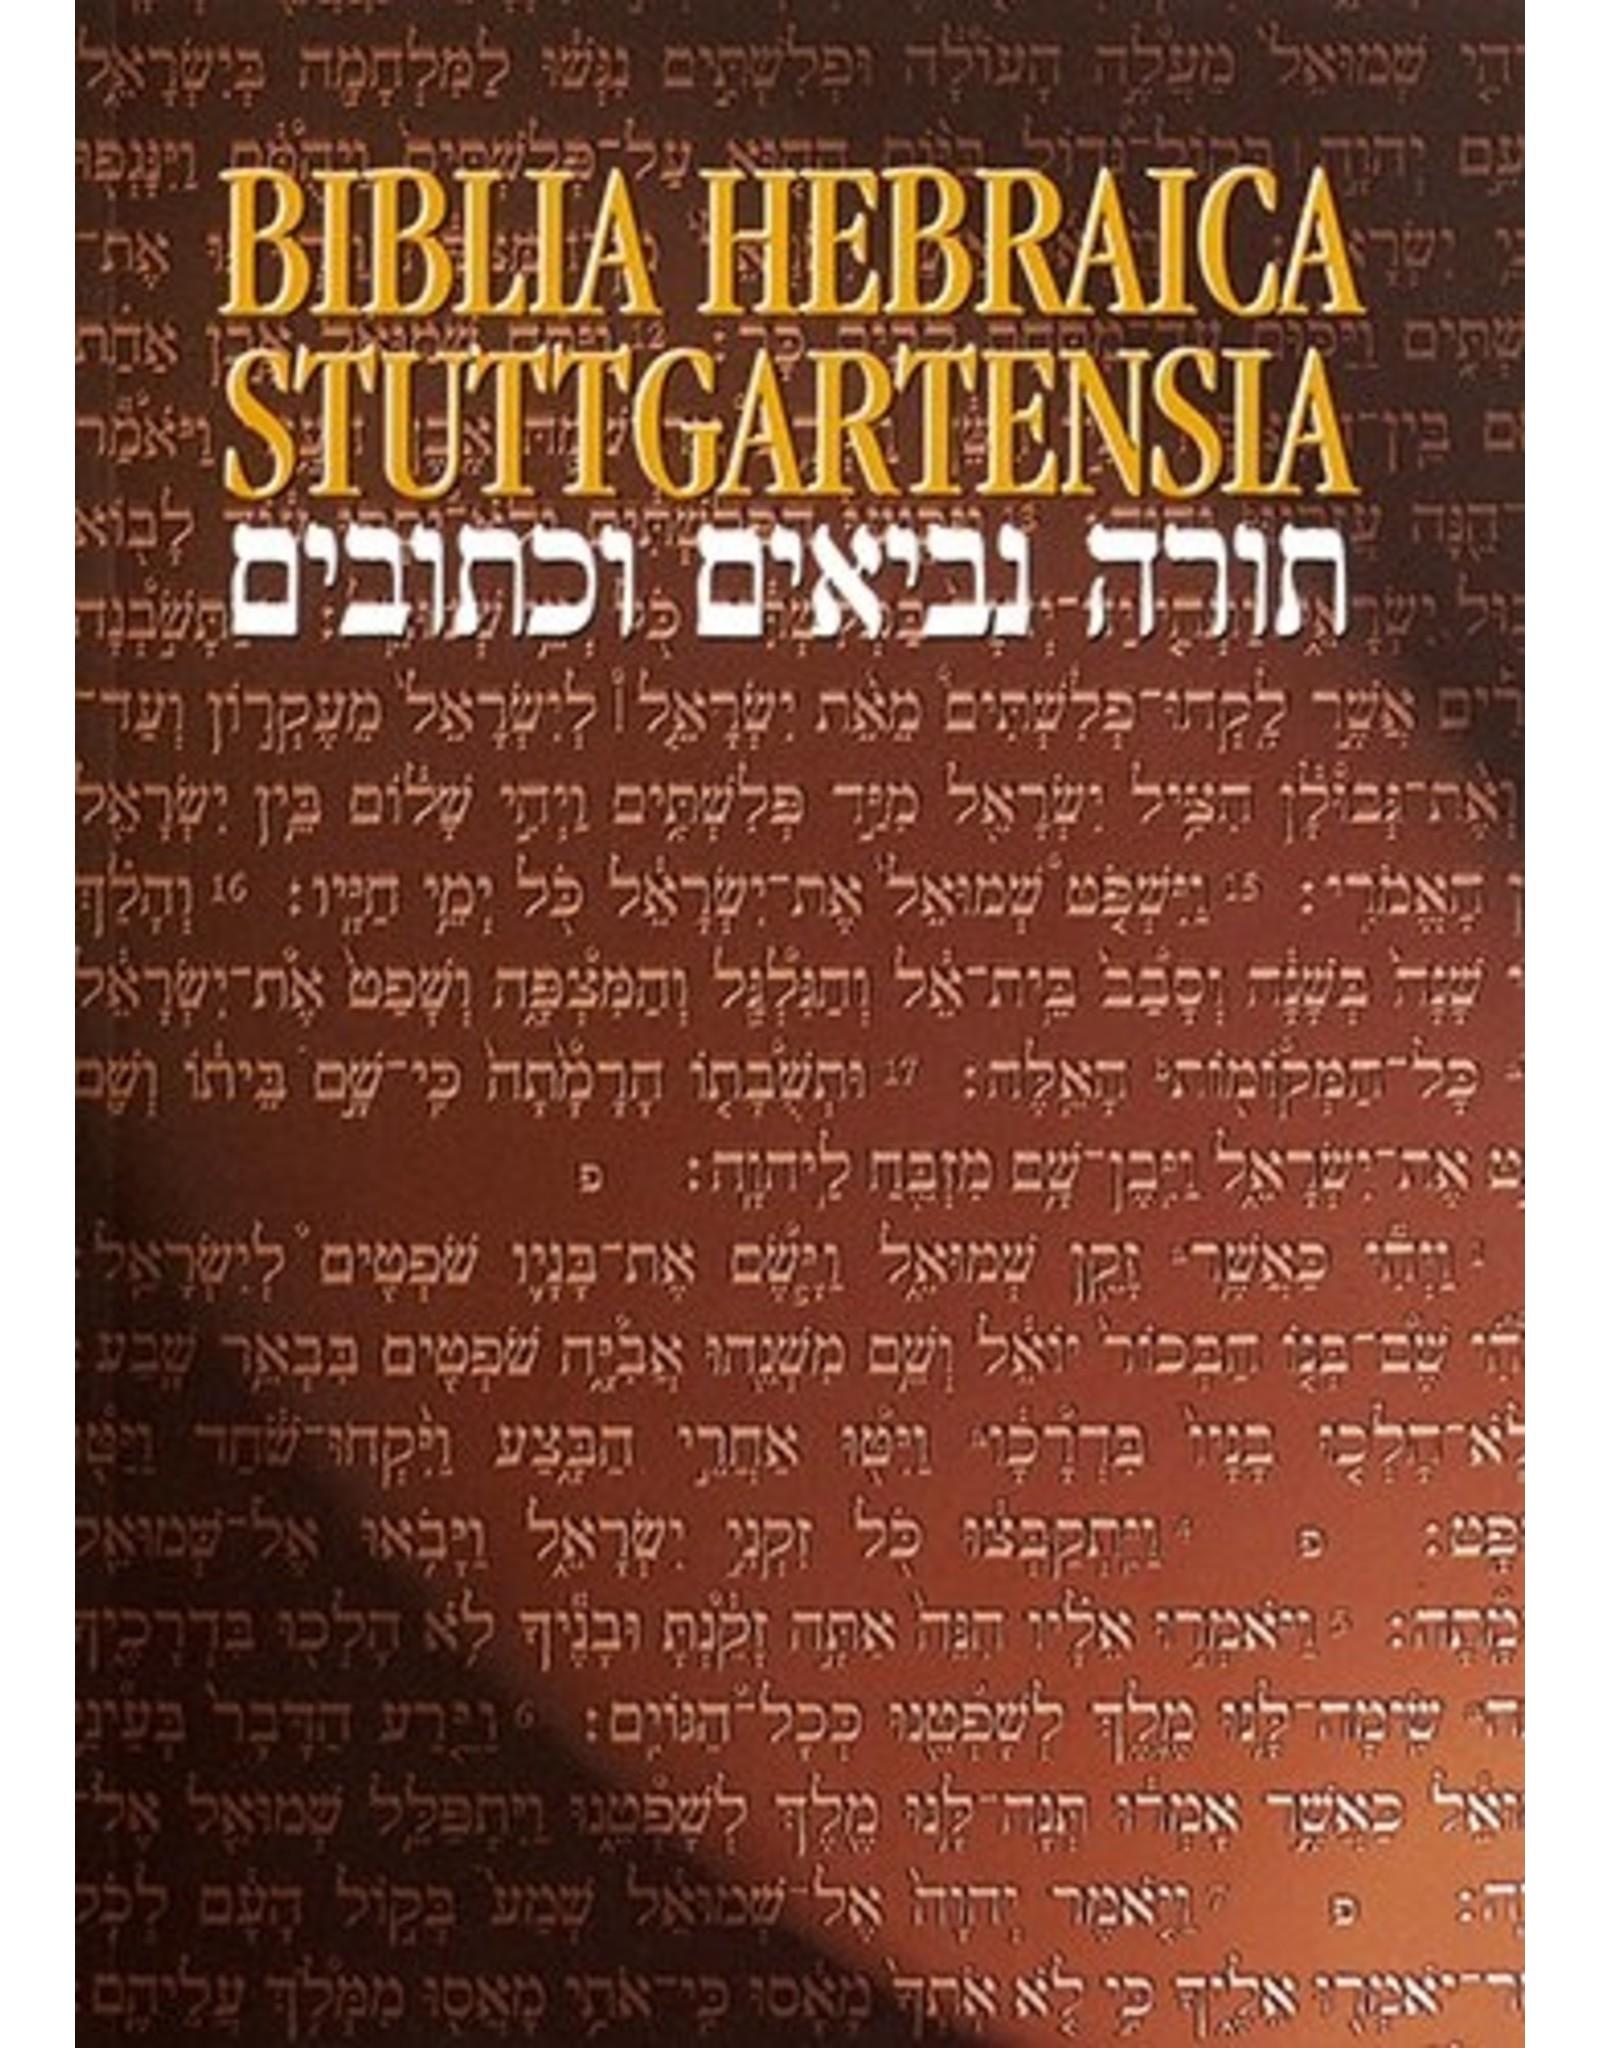 Hendrickson Biblia Hebraica Stuttgartensia (PB)